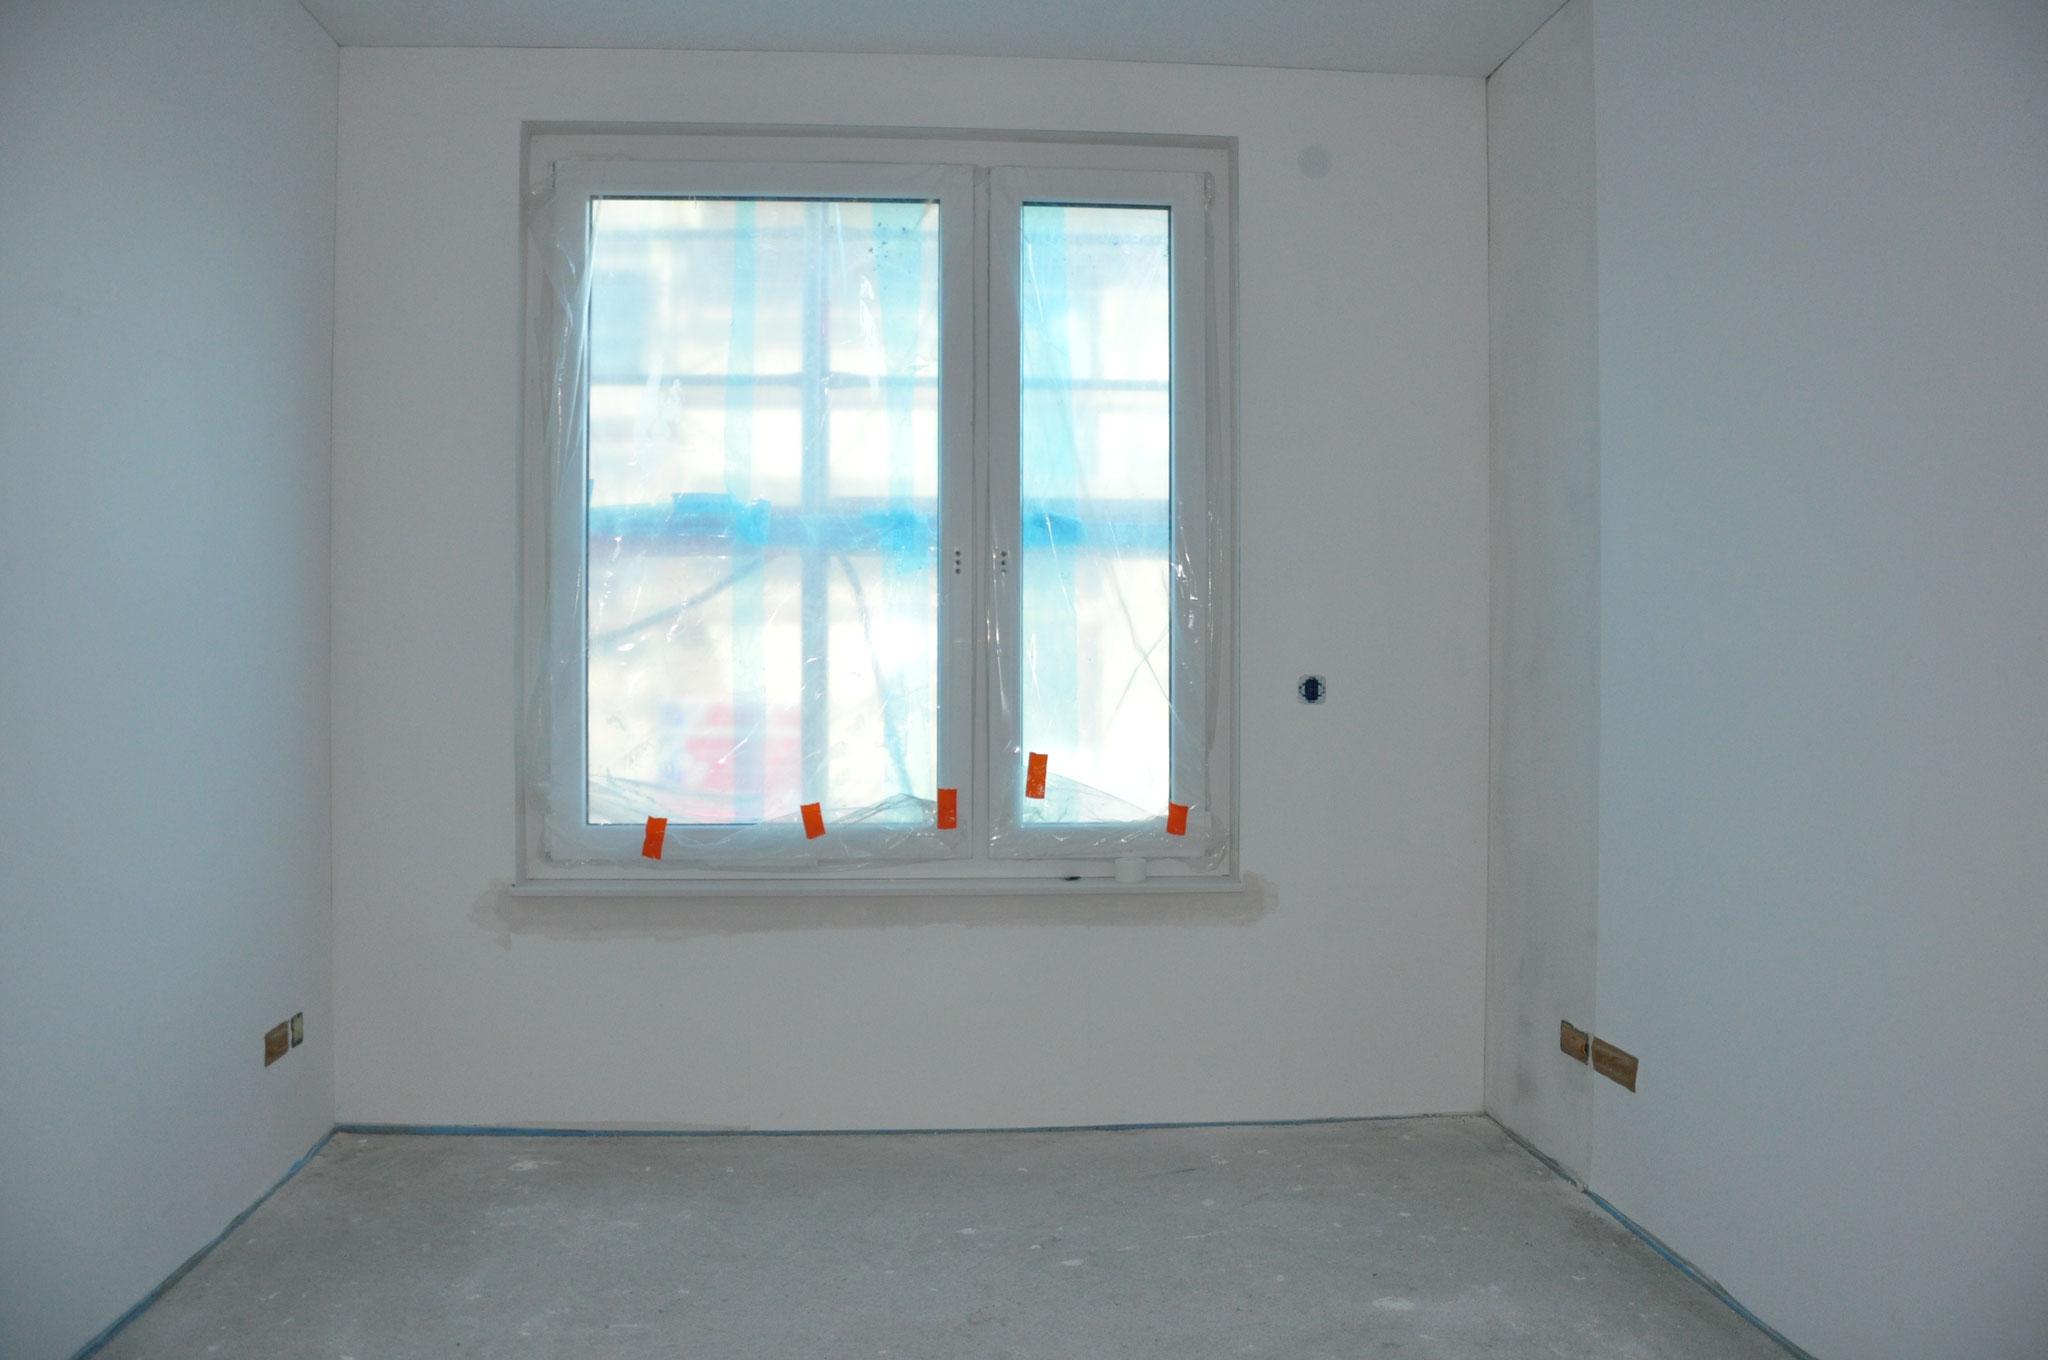 musterwohnung in wentorf optimmo home staging hamburg. Black Bedroom Furniture Sets. Home Design Ideas